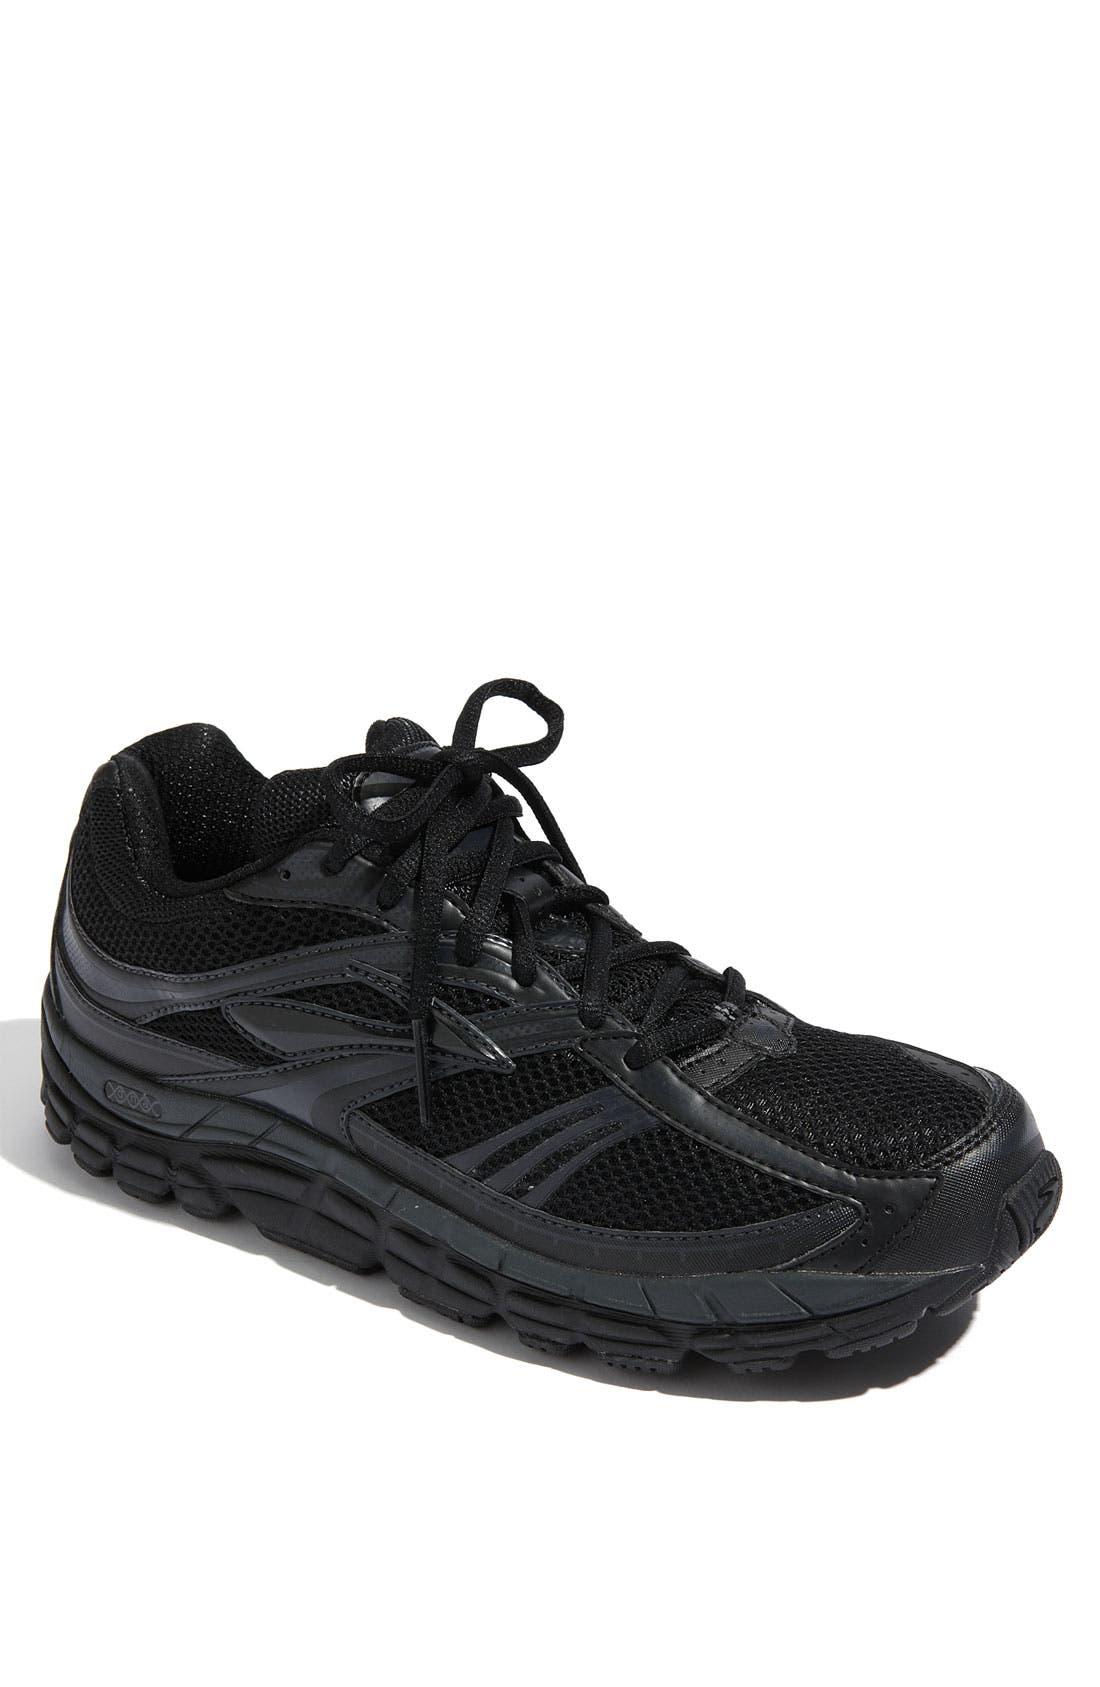 Alternate Image 1 Selected - Brooks 'Addiction 10' Running Shoe (Men)